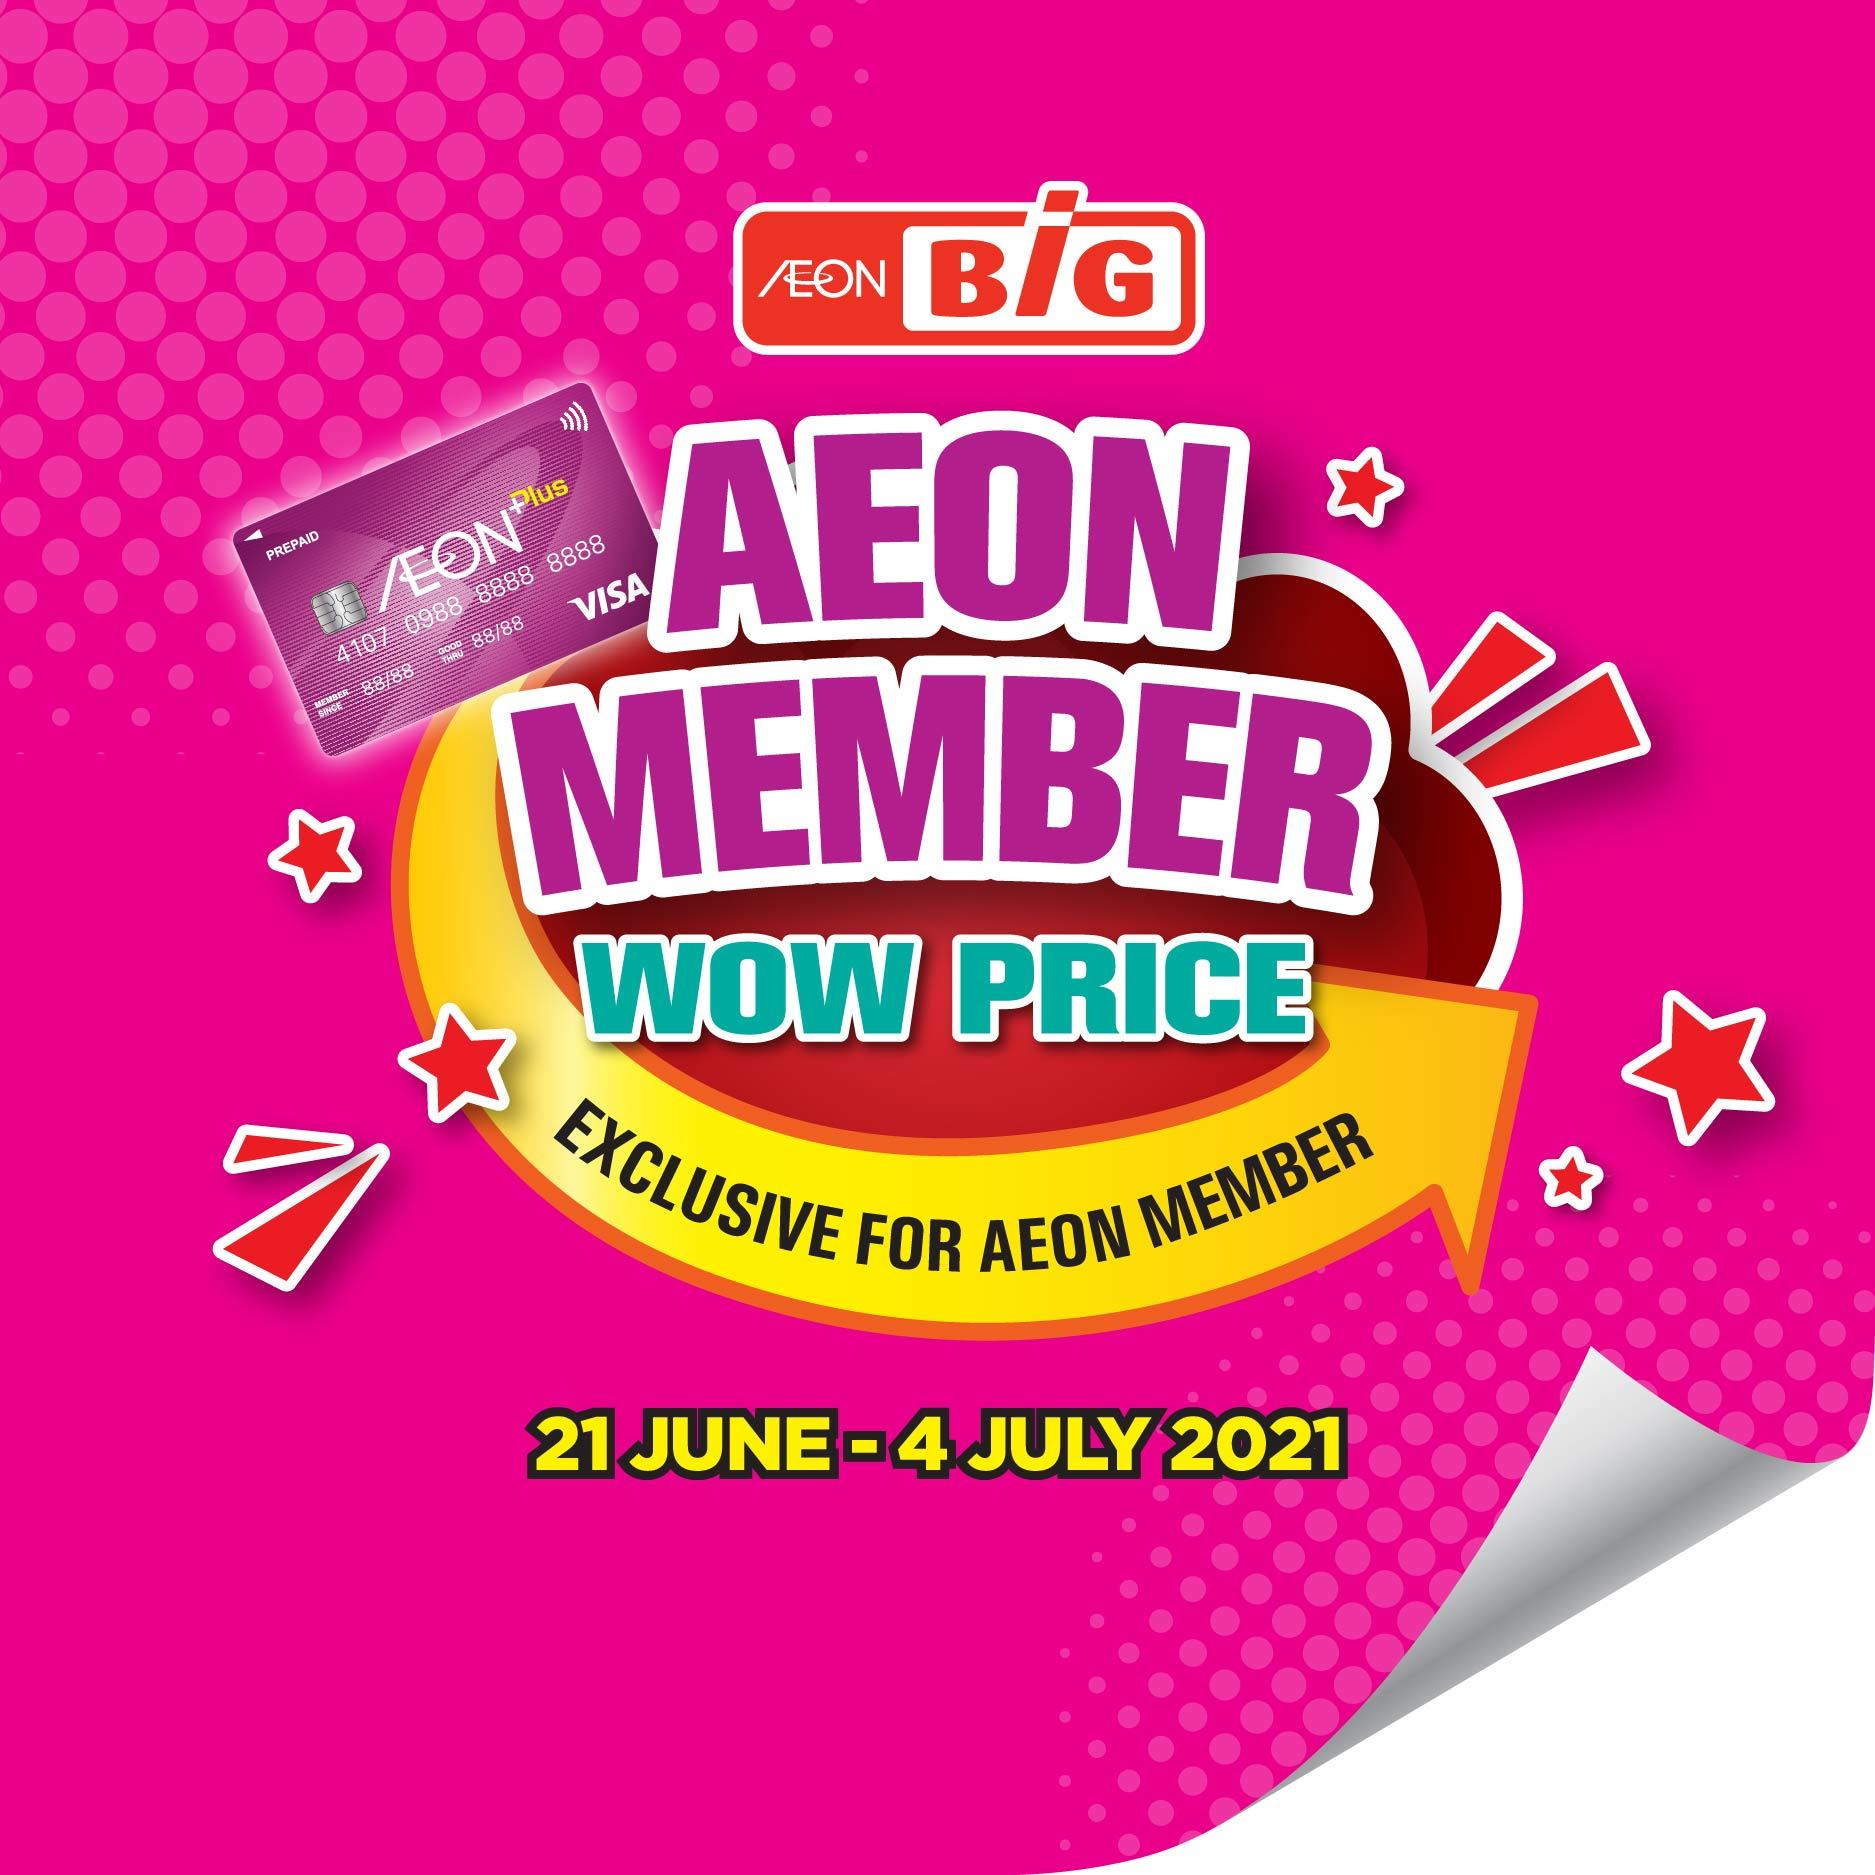 Aeon Big Catalogue(21 June 2021 - 4 July 2021)